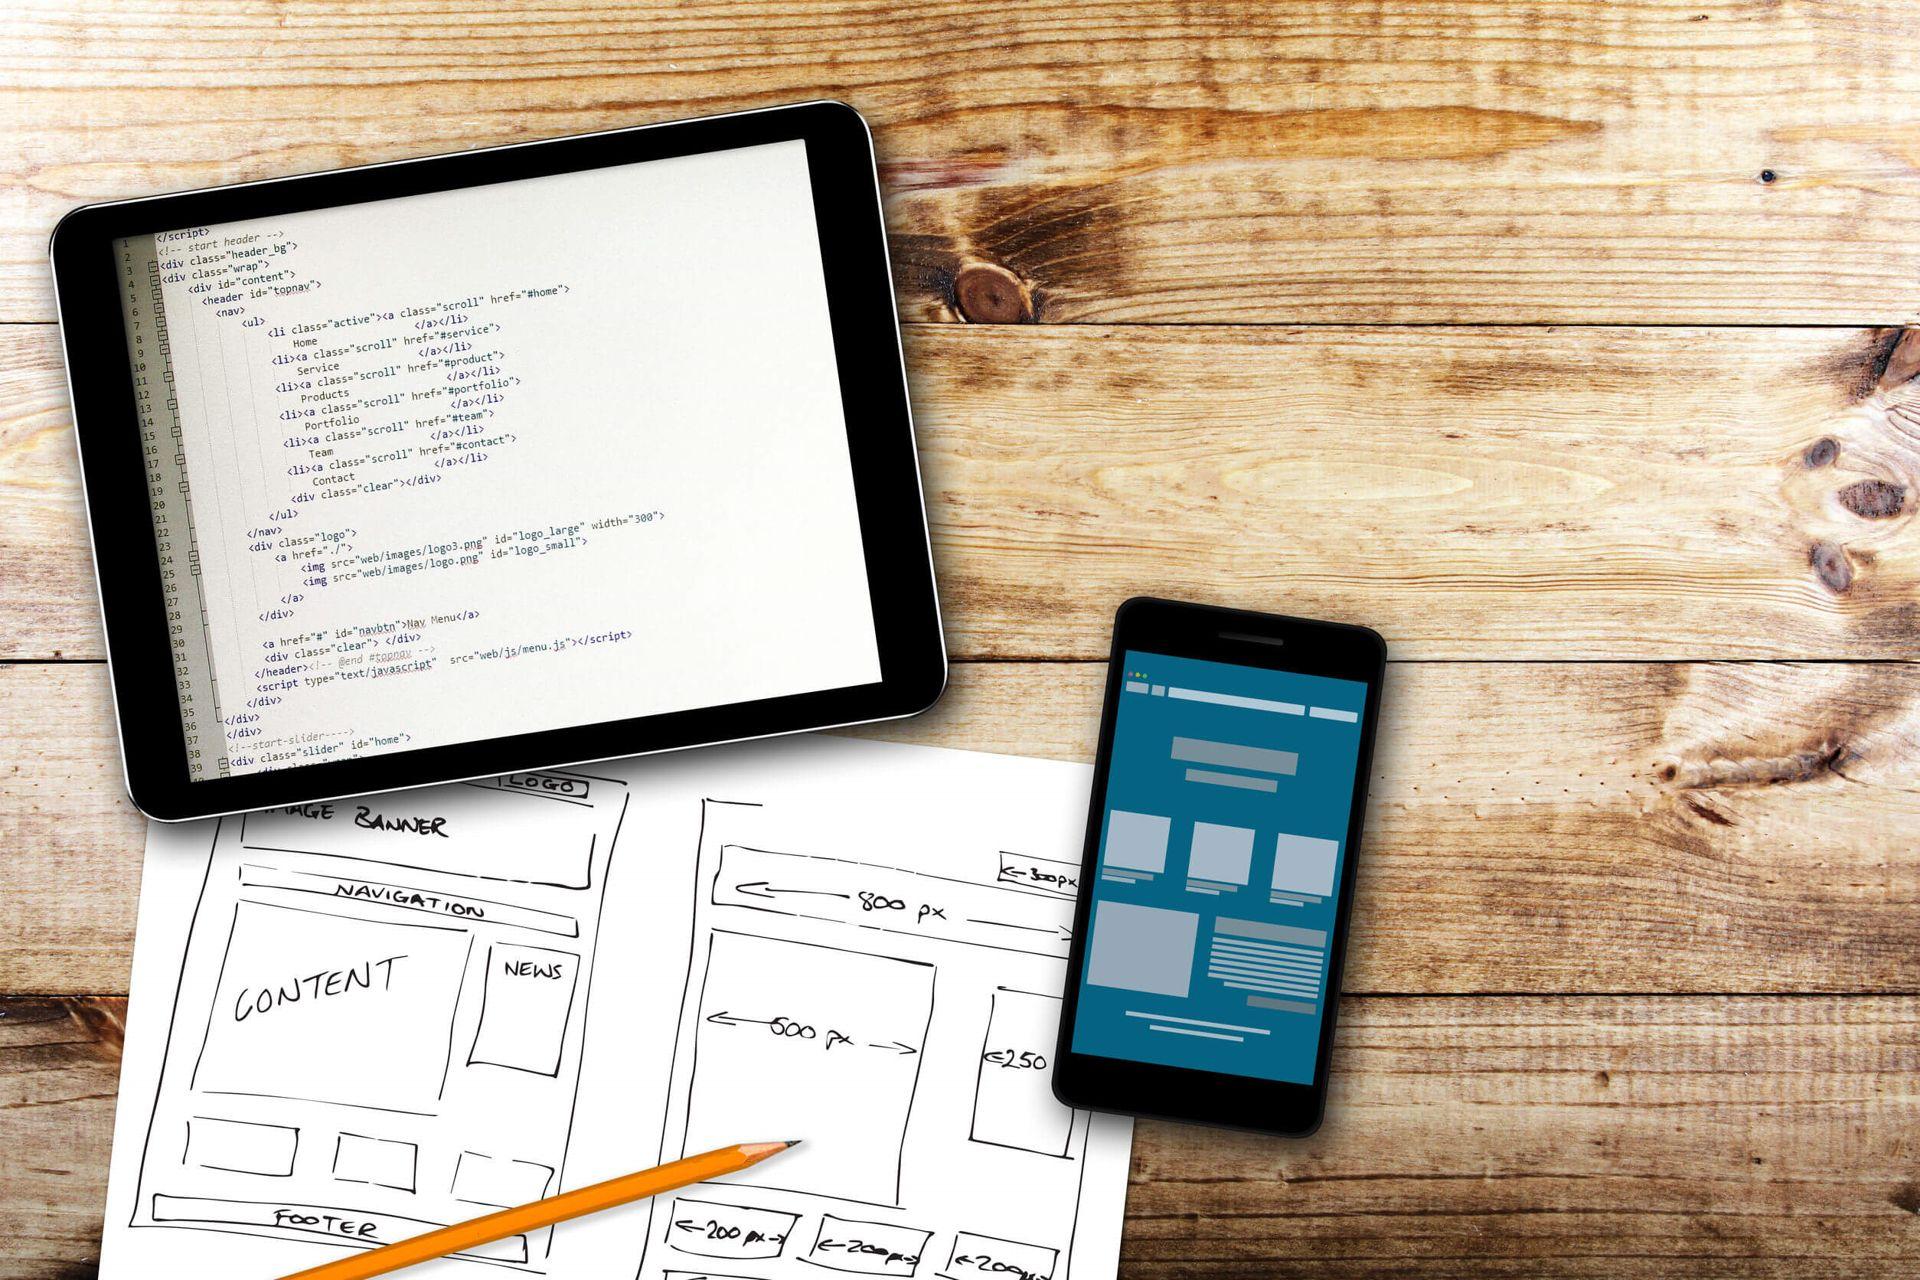 Diseño web responsive es Sitges